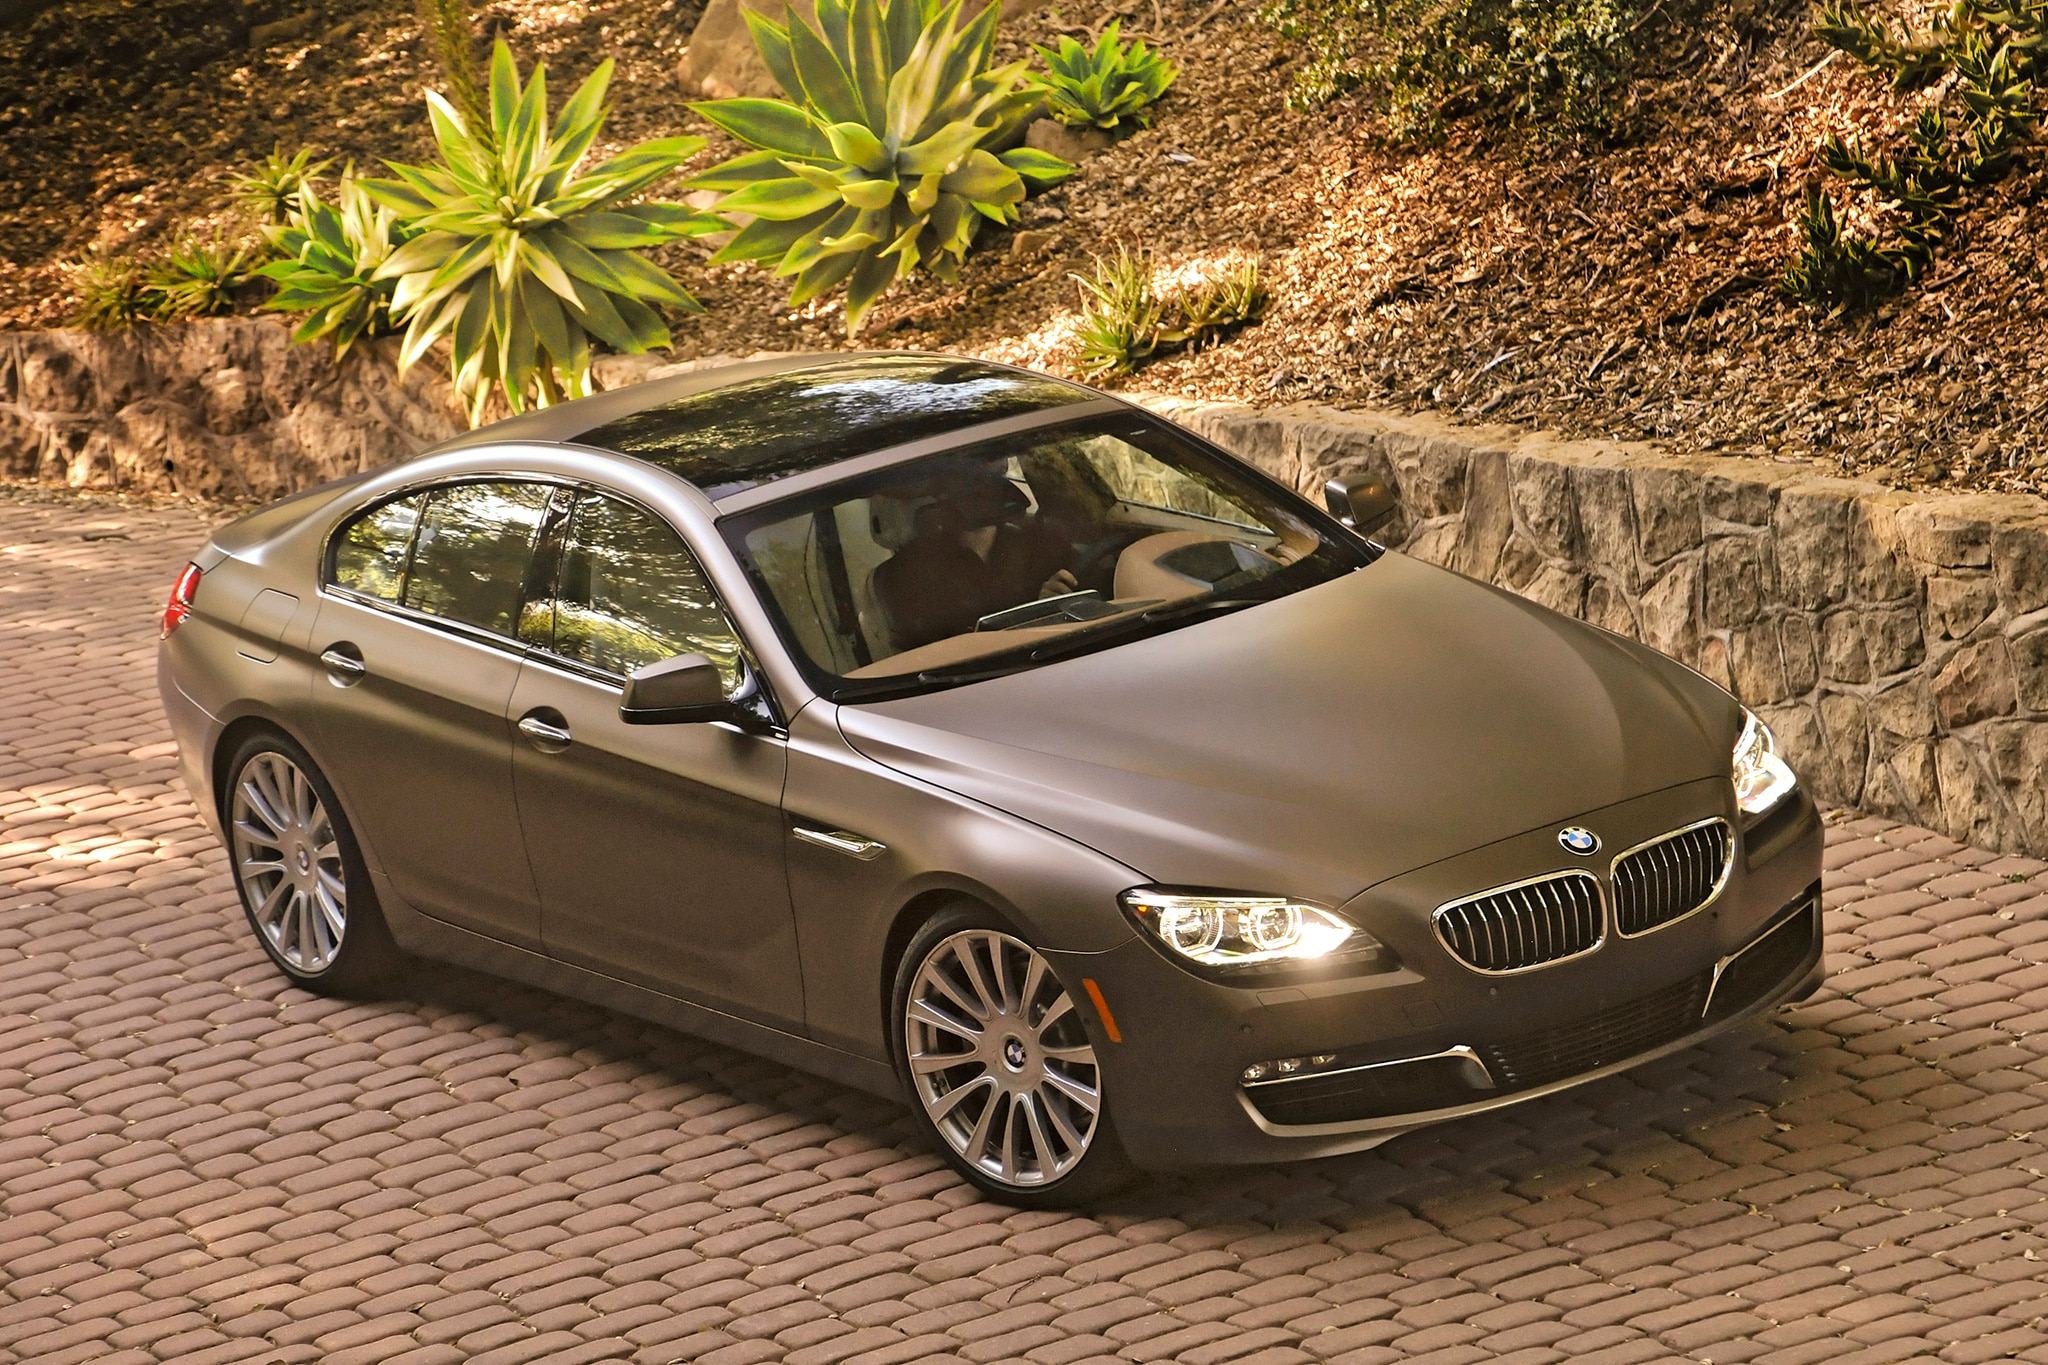 2014 BMW 6 Series Gran Coupe Three Quarters View 41